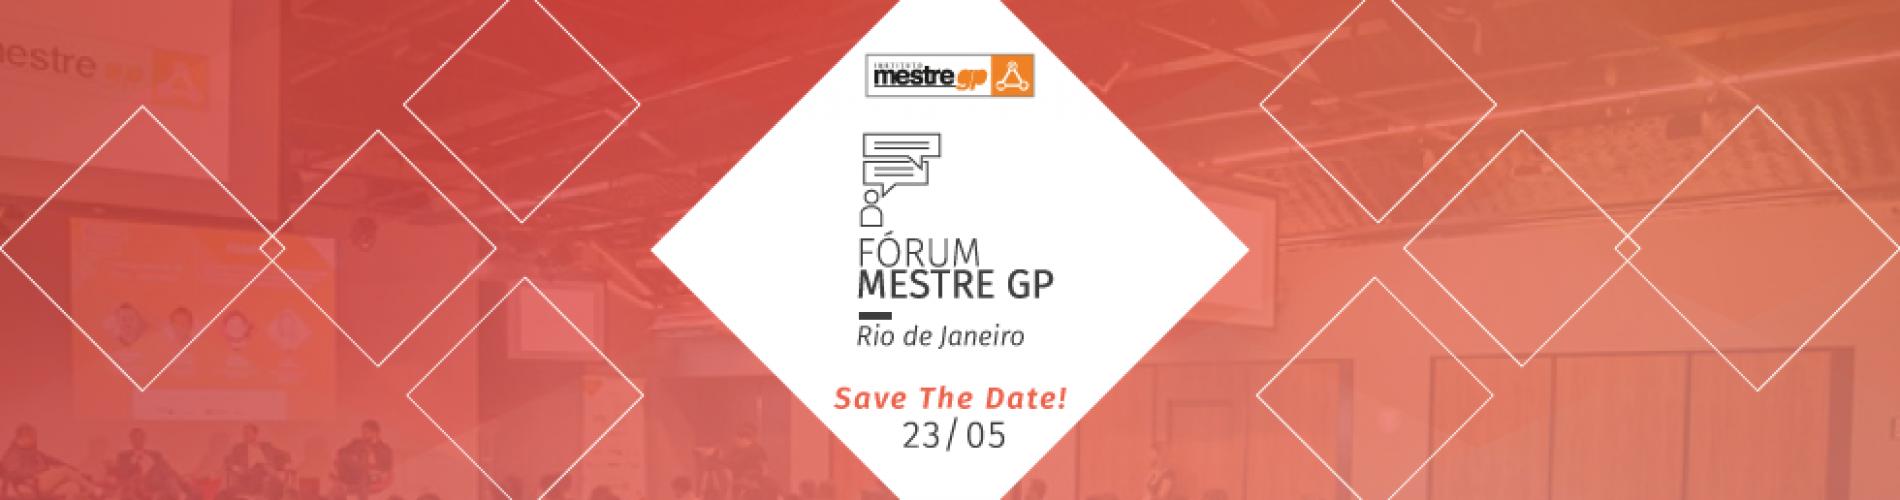 inscricoes-abertas-forum-mestre-gp-rj